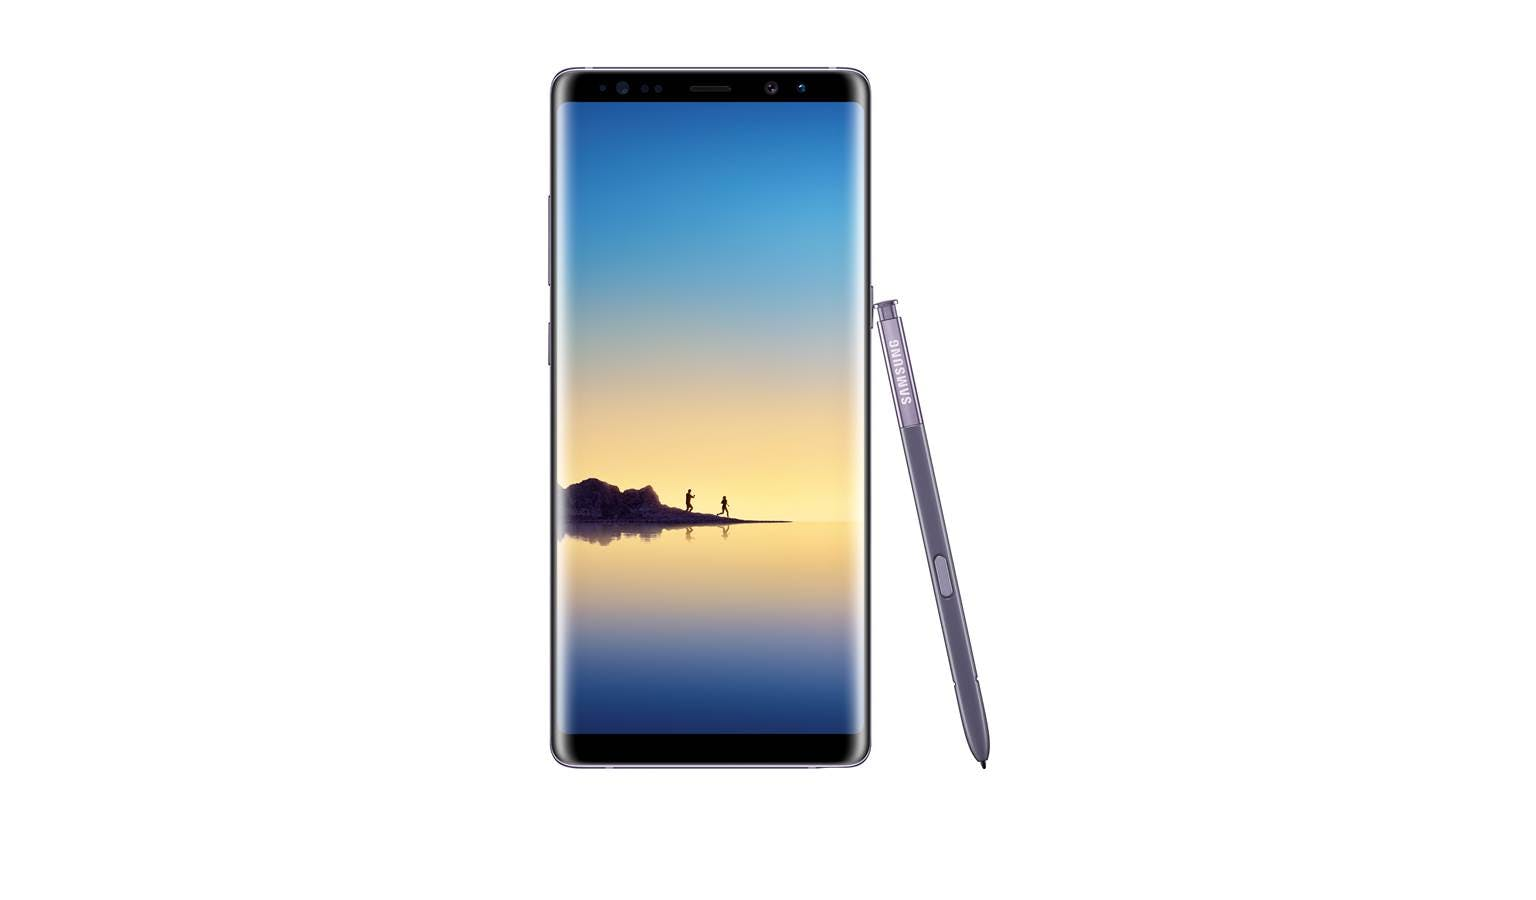 Samsung demo Grey Orchid Unit - Note8 Galaxy